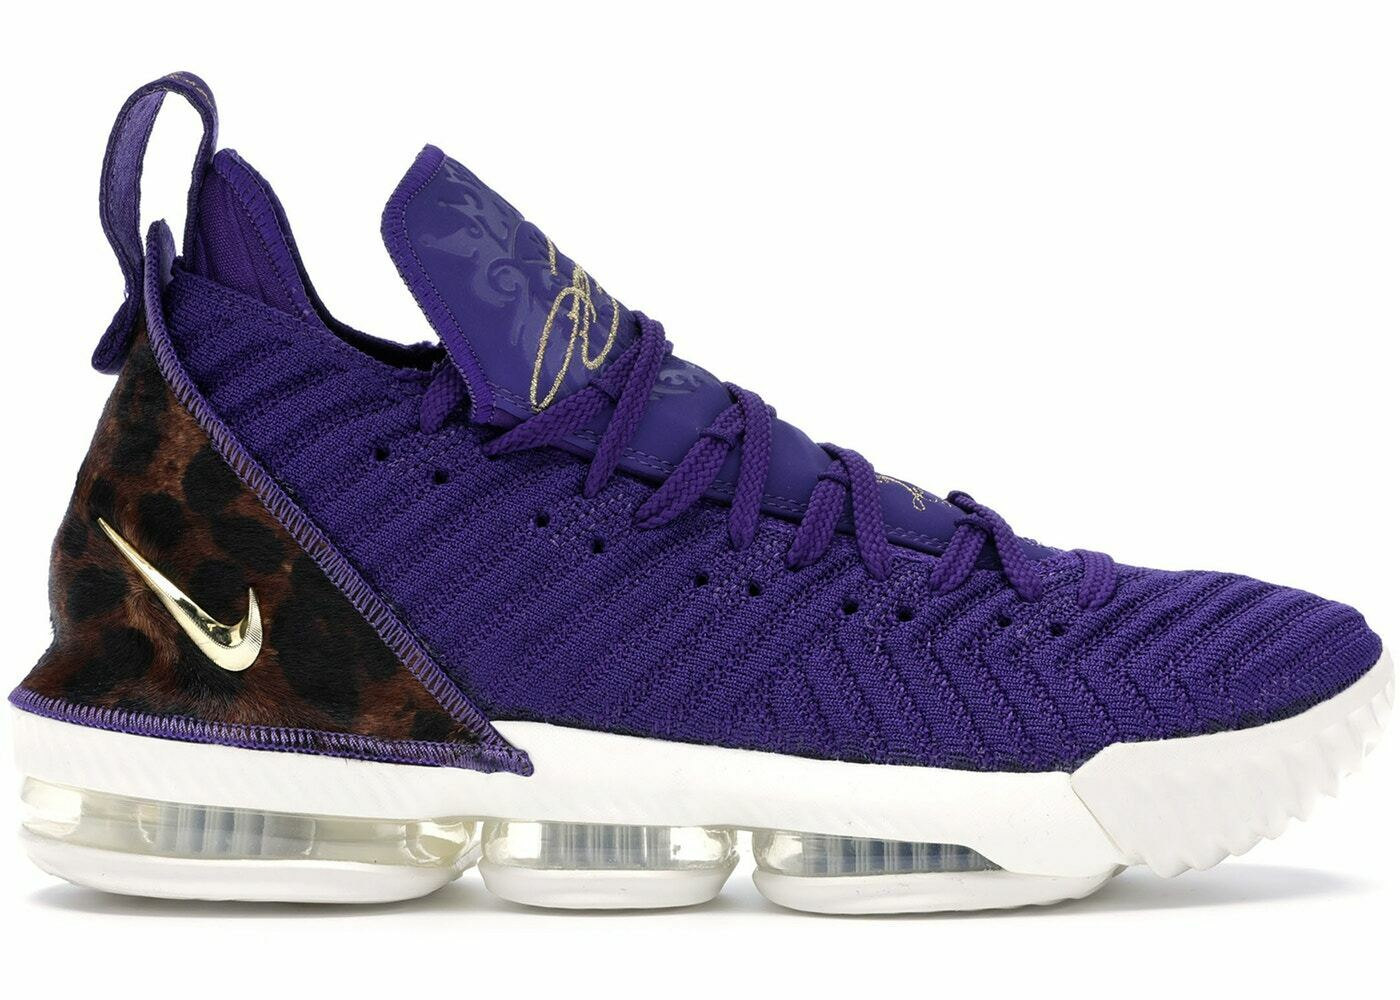 5b6b3ac70d49 Nike Nike Nike Lebron 16 XVI King Court Purple Los Angeles Lakers Size 14.  AO2588